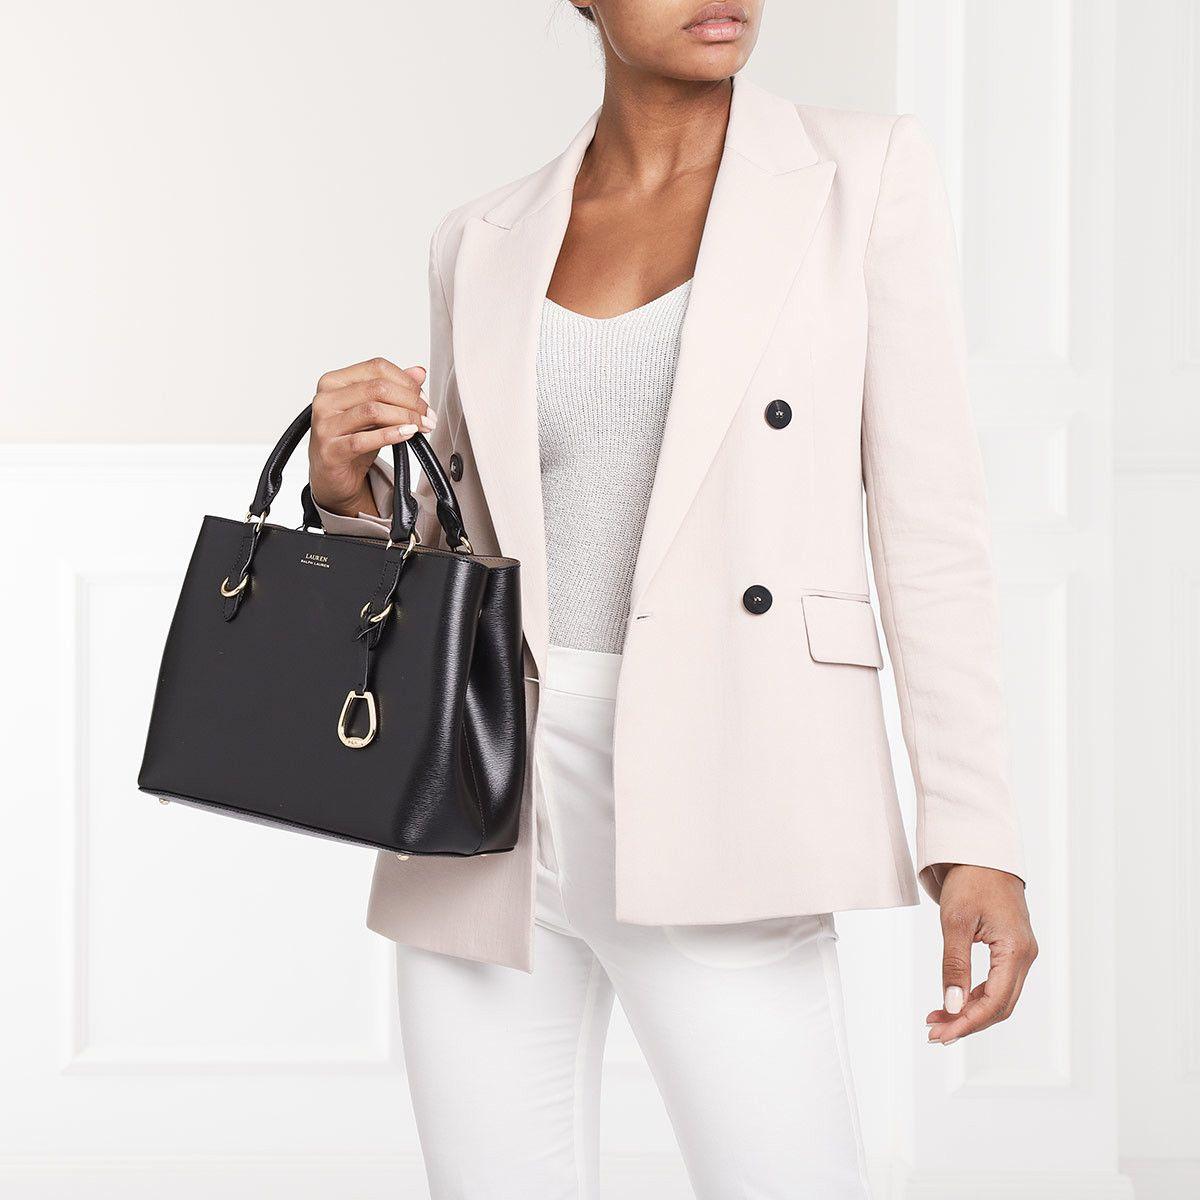 e2e2373c382 Handtasche, Lauren Ralph Lauren, Bennington Satchel Medium Black Truffle